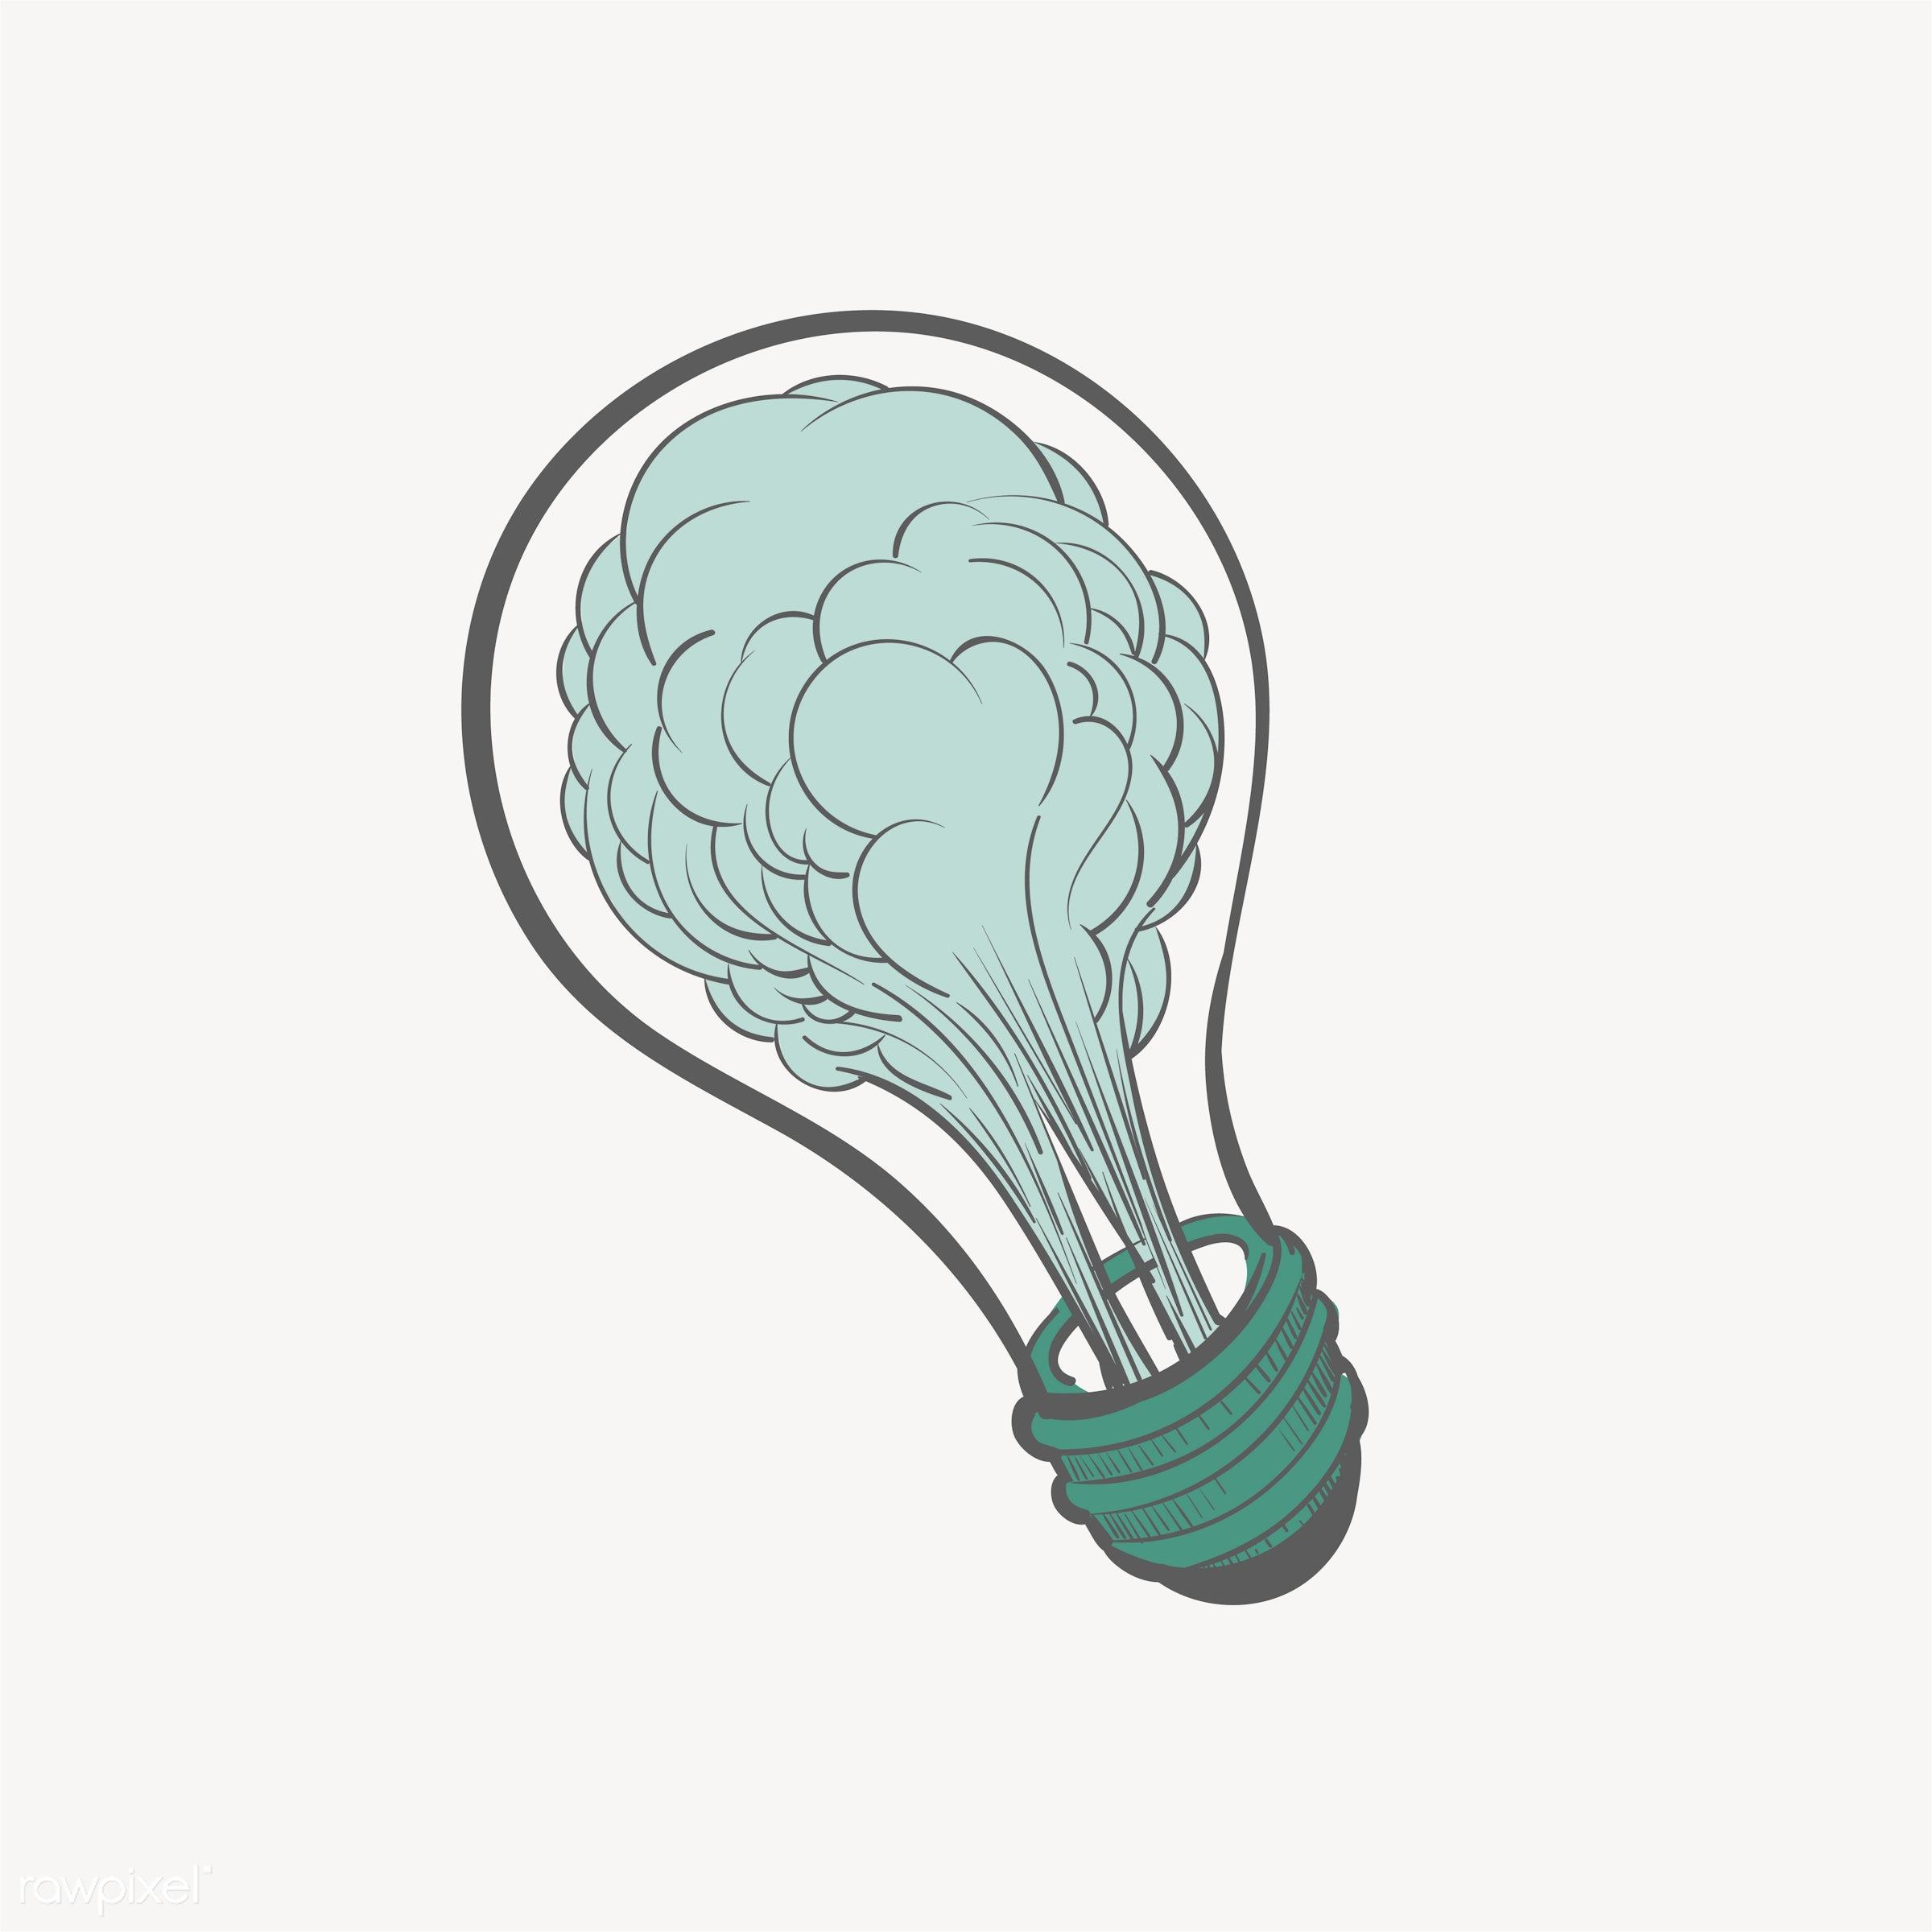 Hand drawing illustration of creative ideas concept - lightbulb, artwork, attitude, brainstorm, creative, design, draw,...